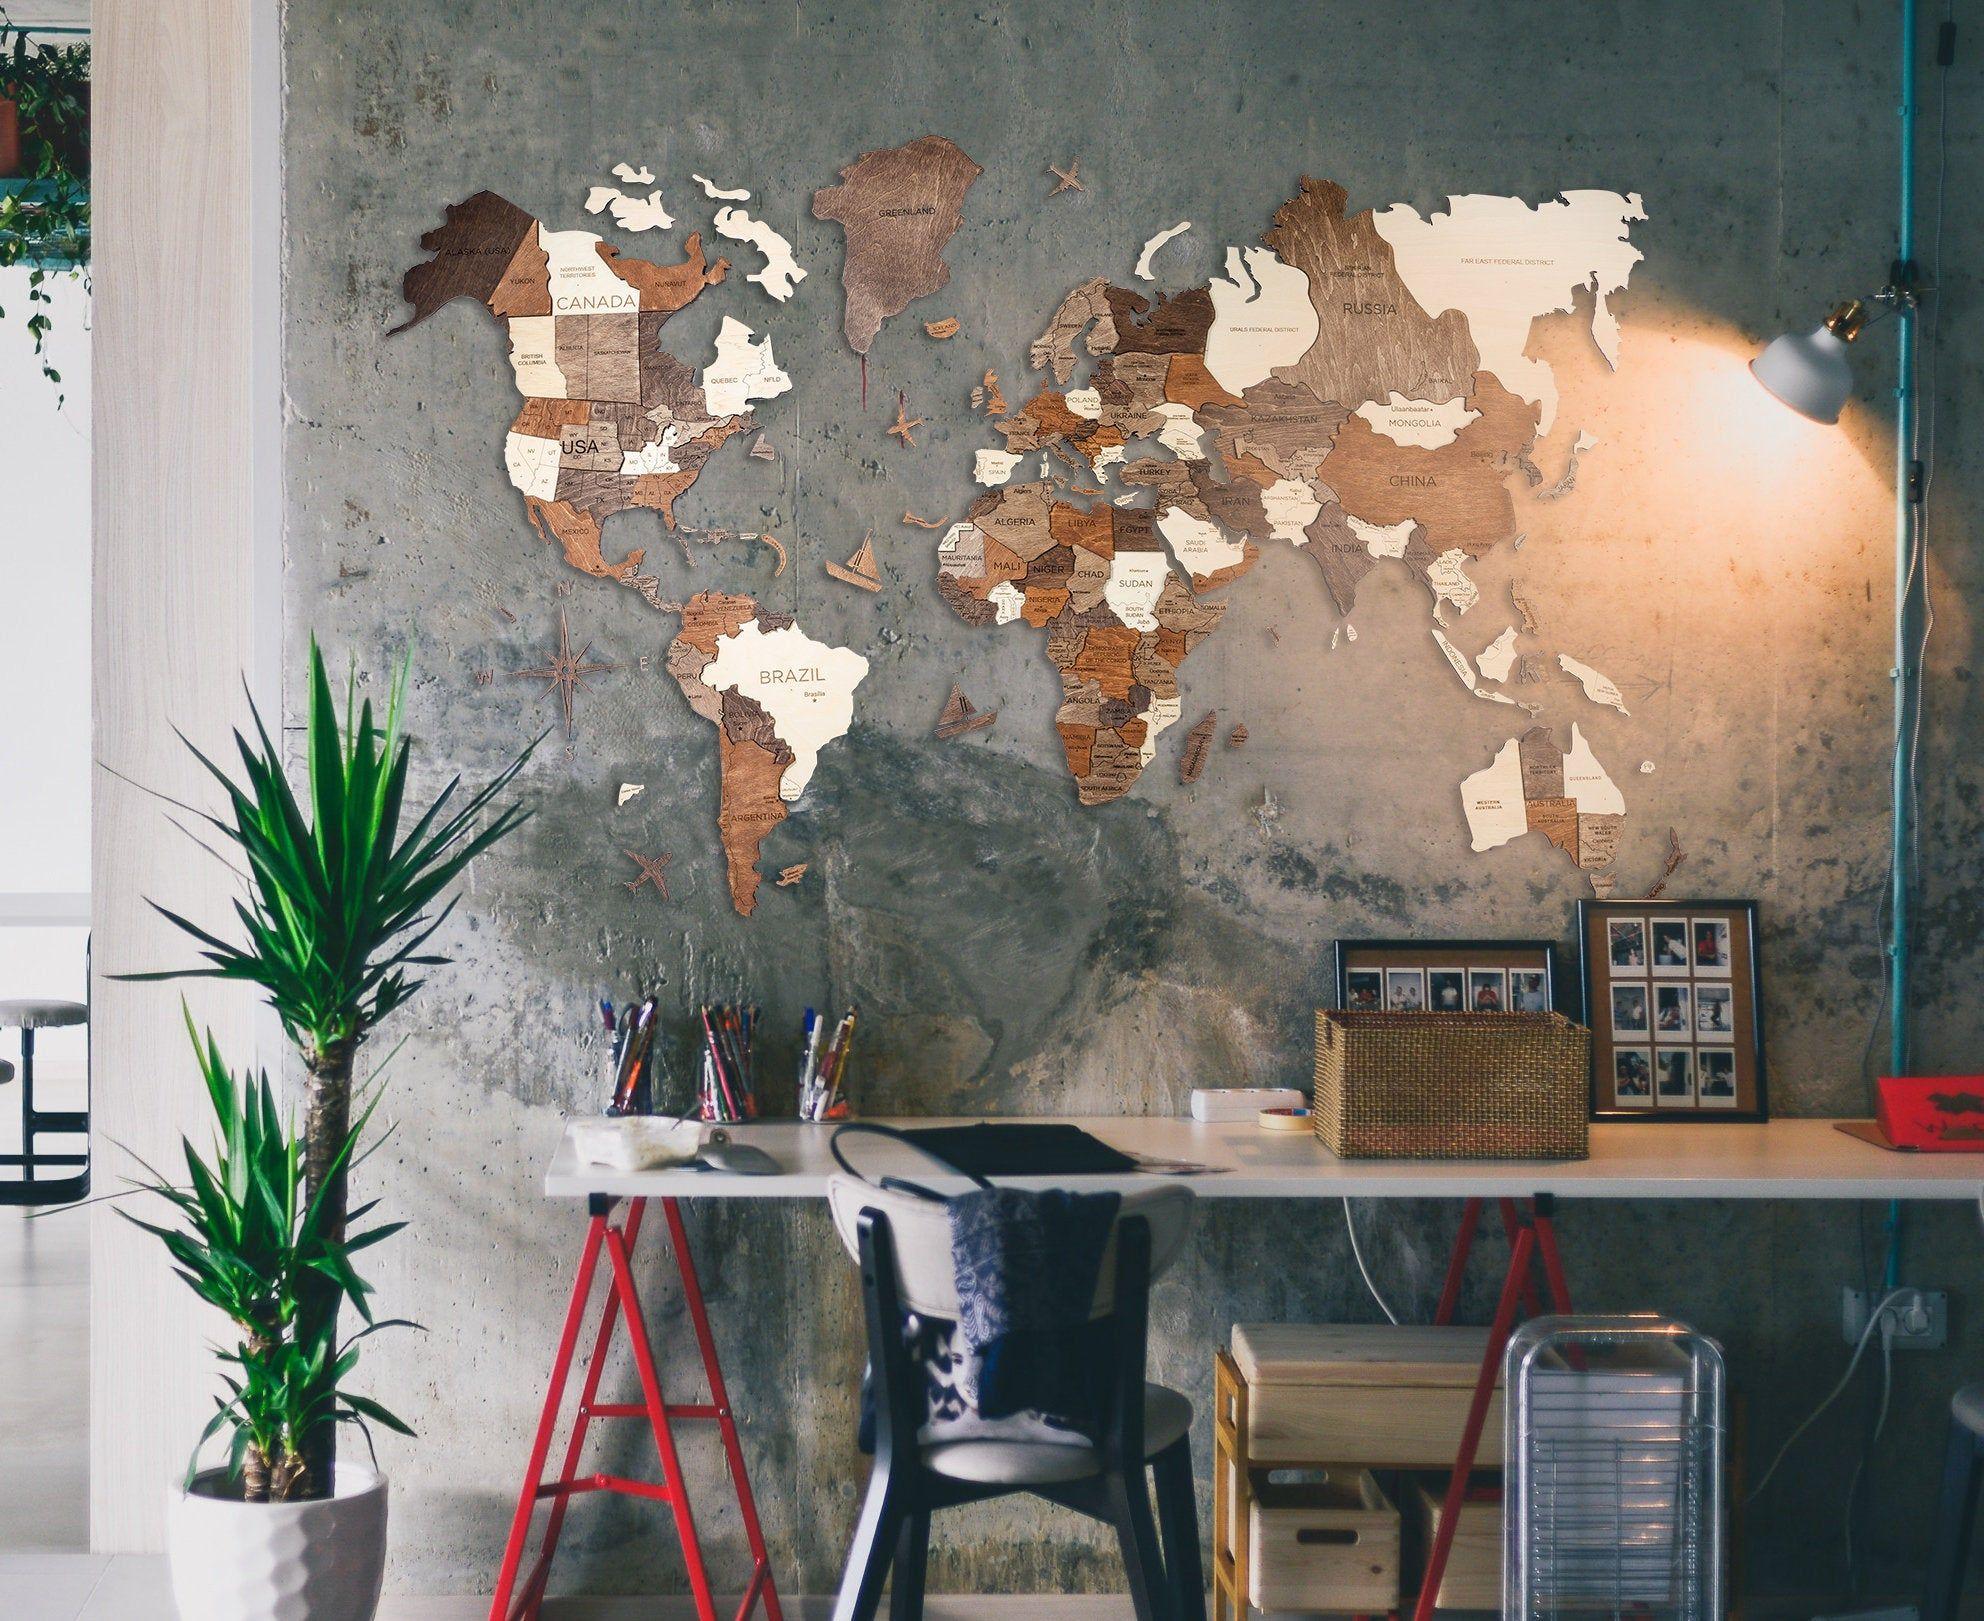 Wand Holz Karte Der Weltkarte Reise Push Pin Karte Rustikale Haus Holz Wandkunst 5 Jahrestagsgeschenk Fur Mann Freund Wand Kunst Dekor In 2020 Wandkaarten Home Decor Klok